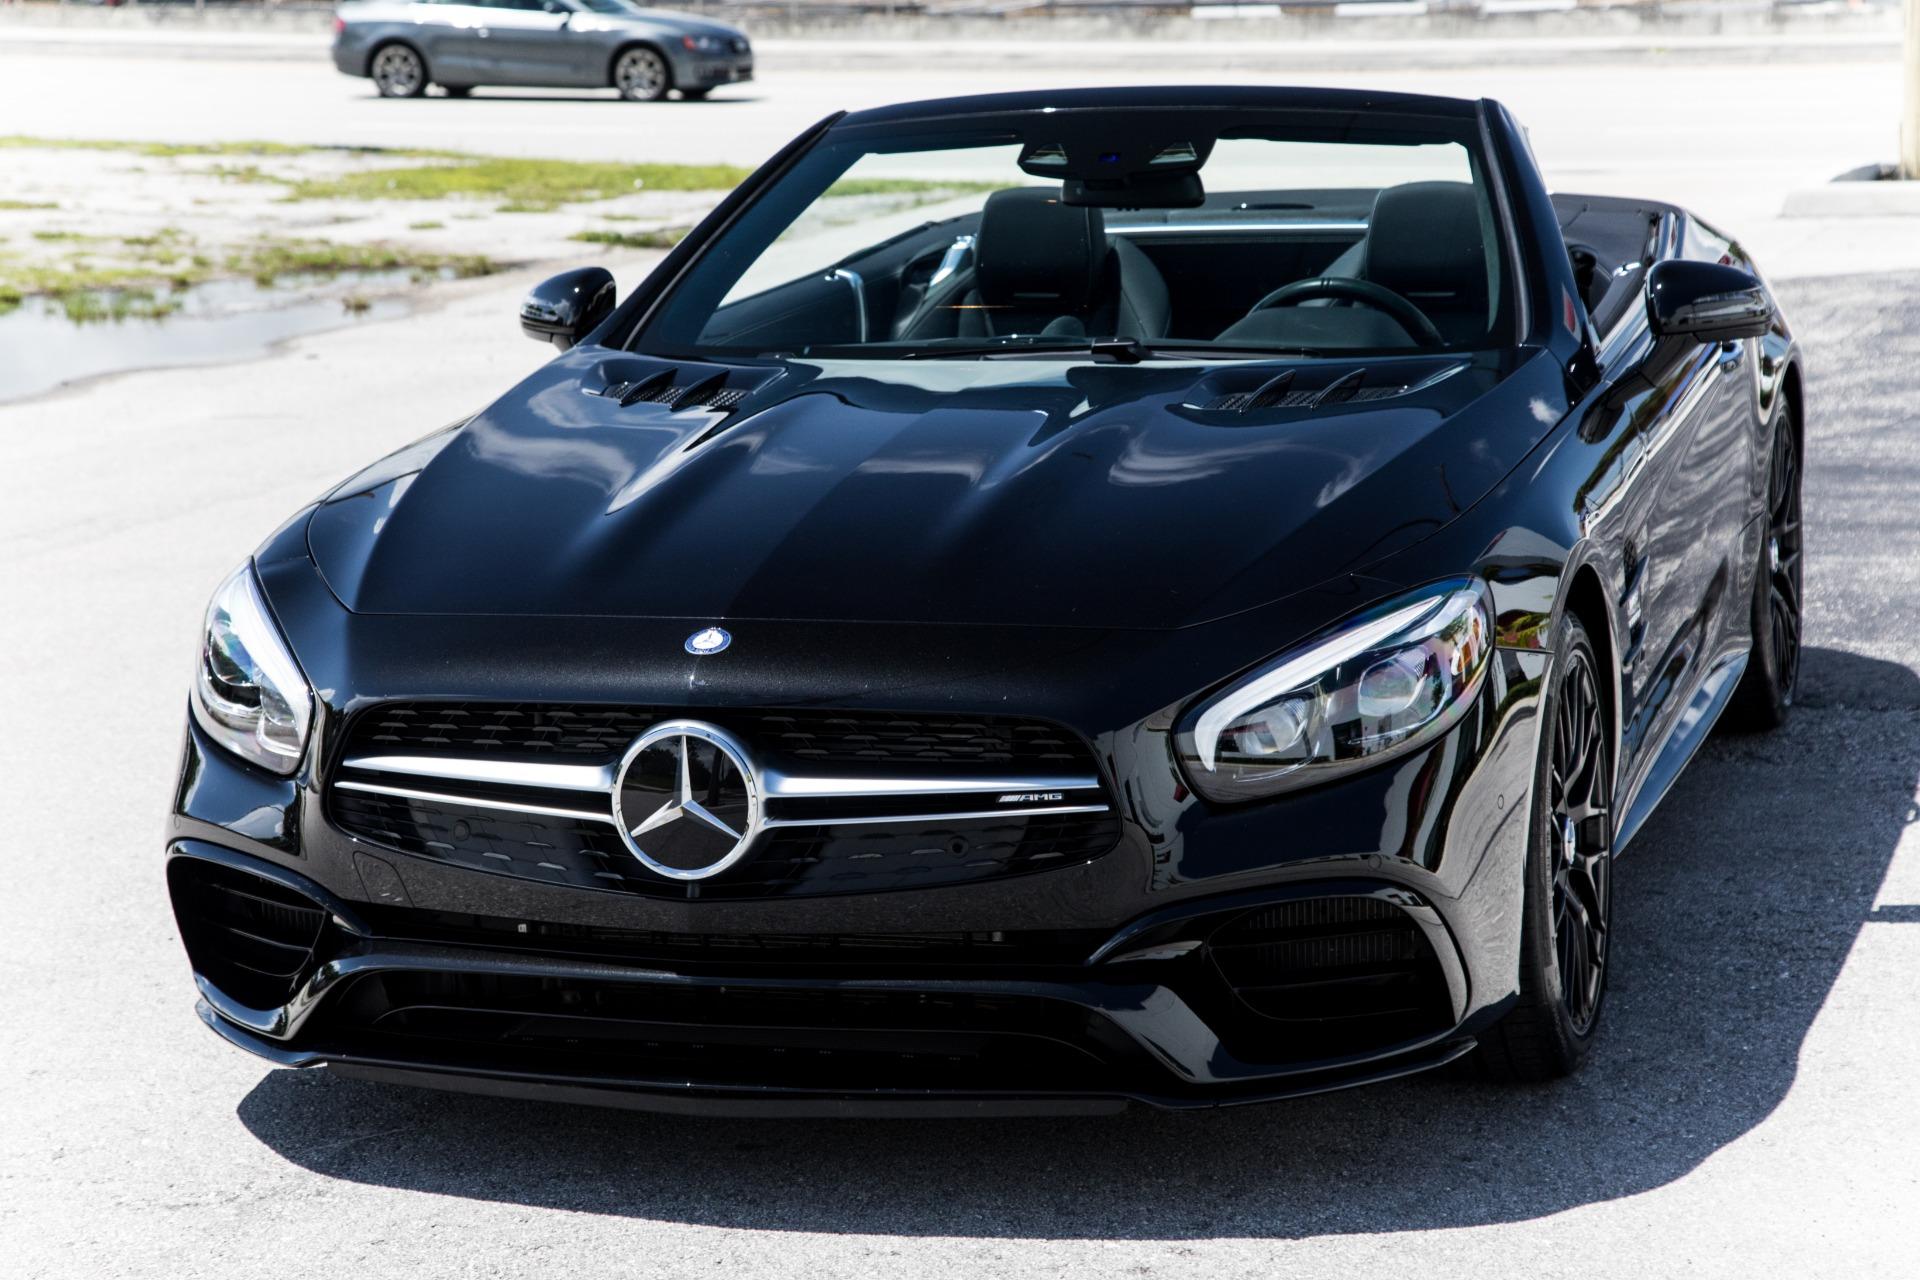 Used-2017-Mercedes-Benz-SL-Class-AMG-SL-63